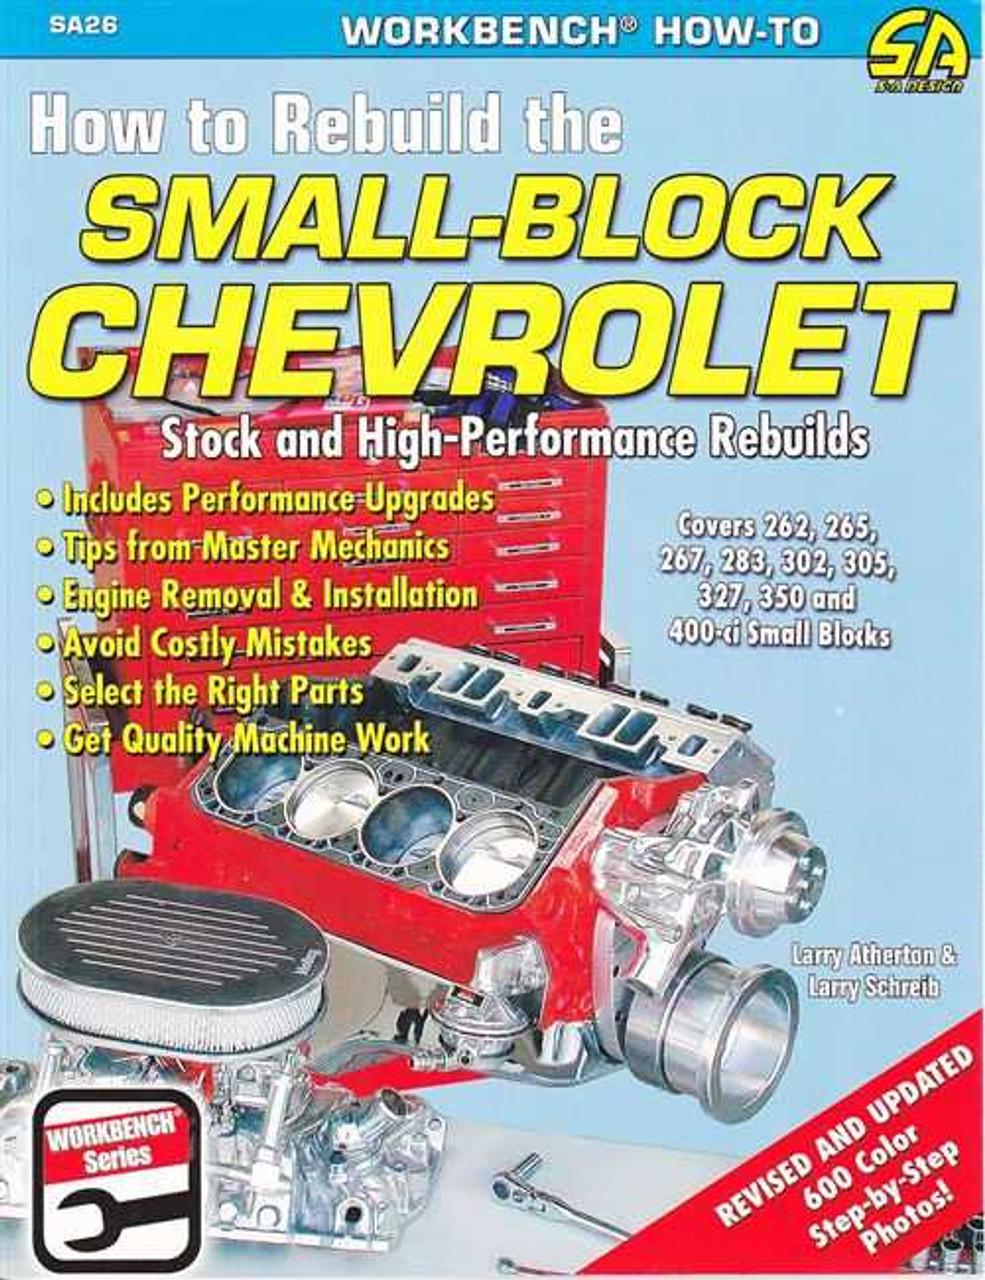 Rebuilt Chevy 350 Short Block